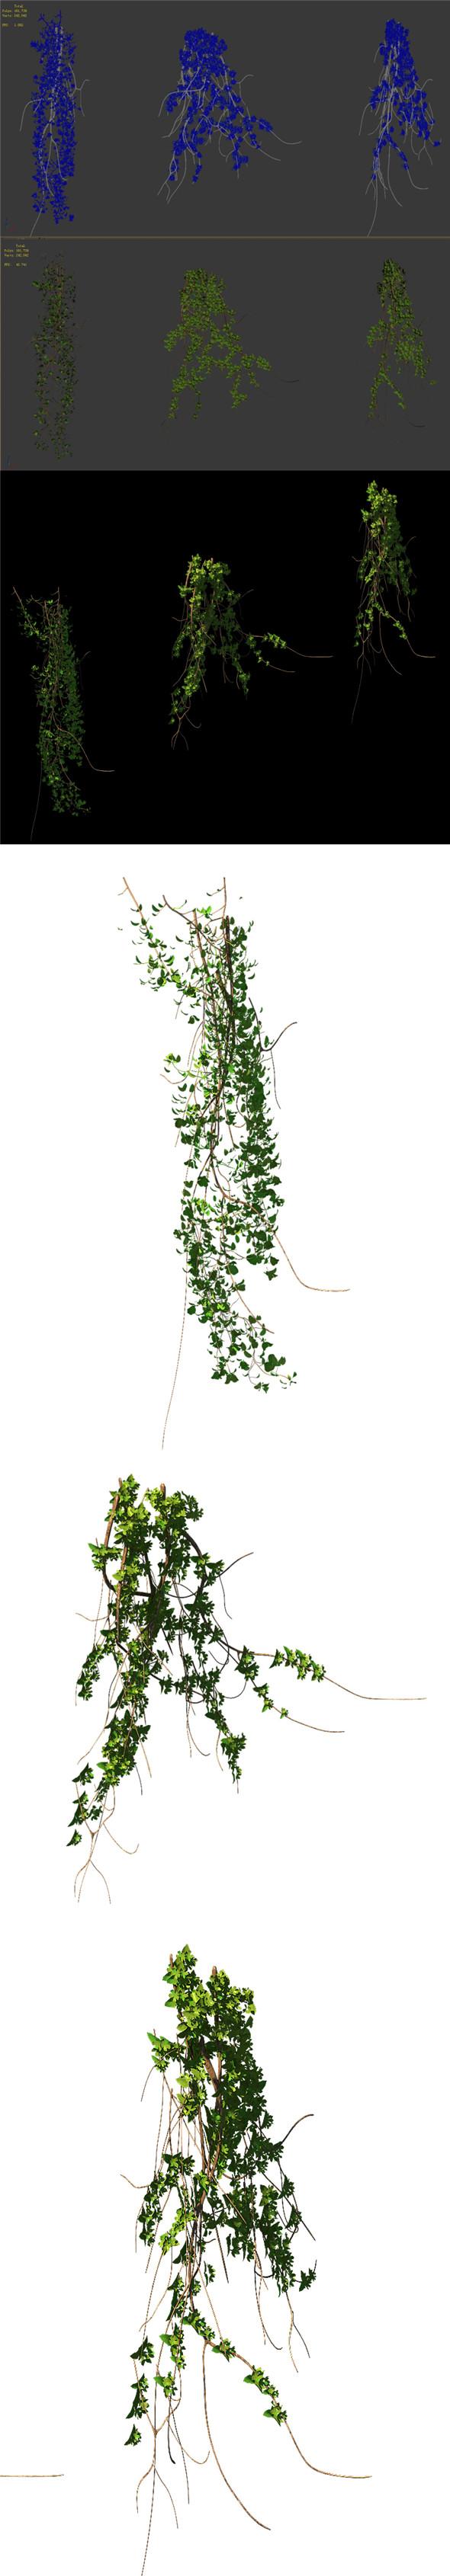 General plant - vines 02 - 3DOcean Item for Sale